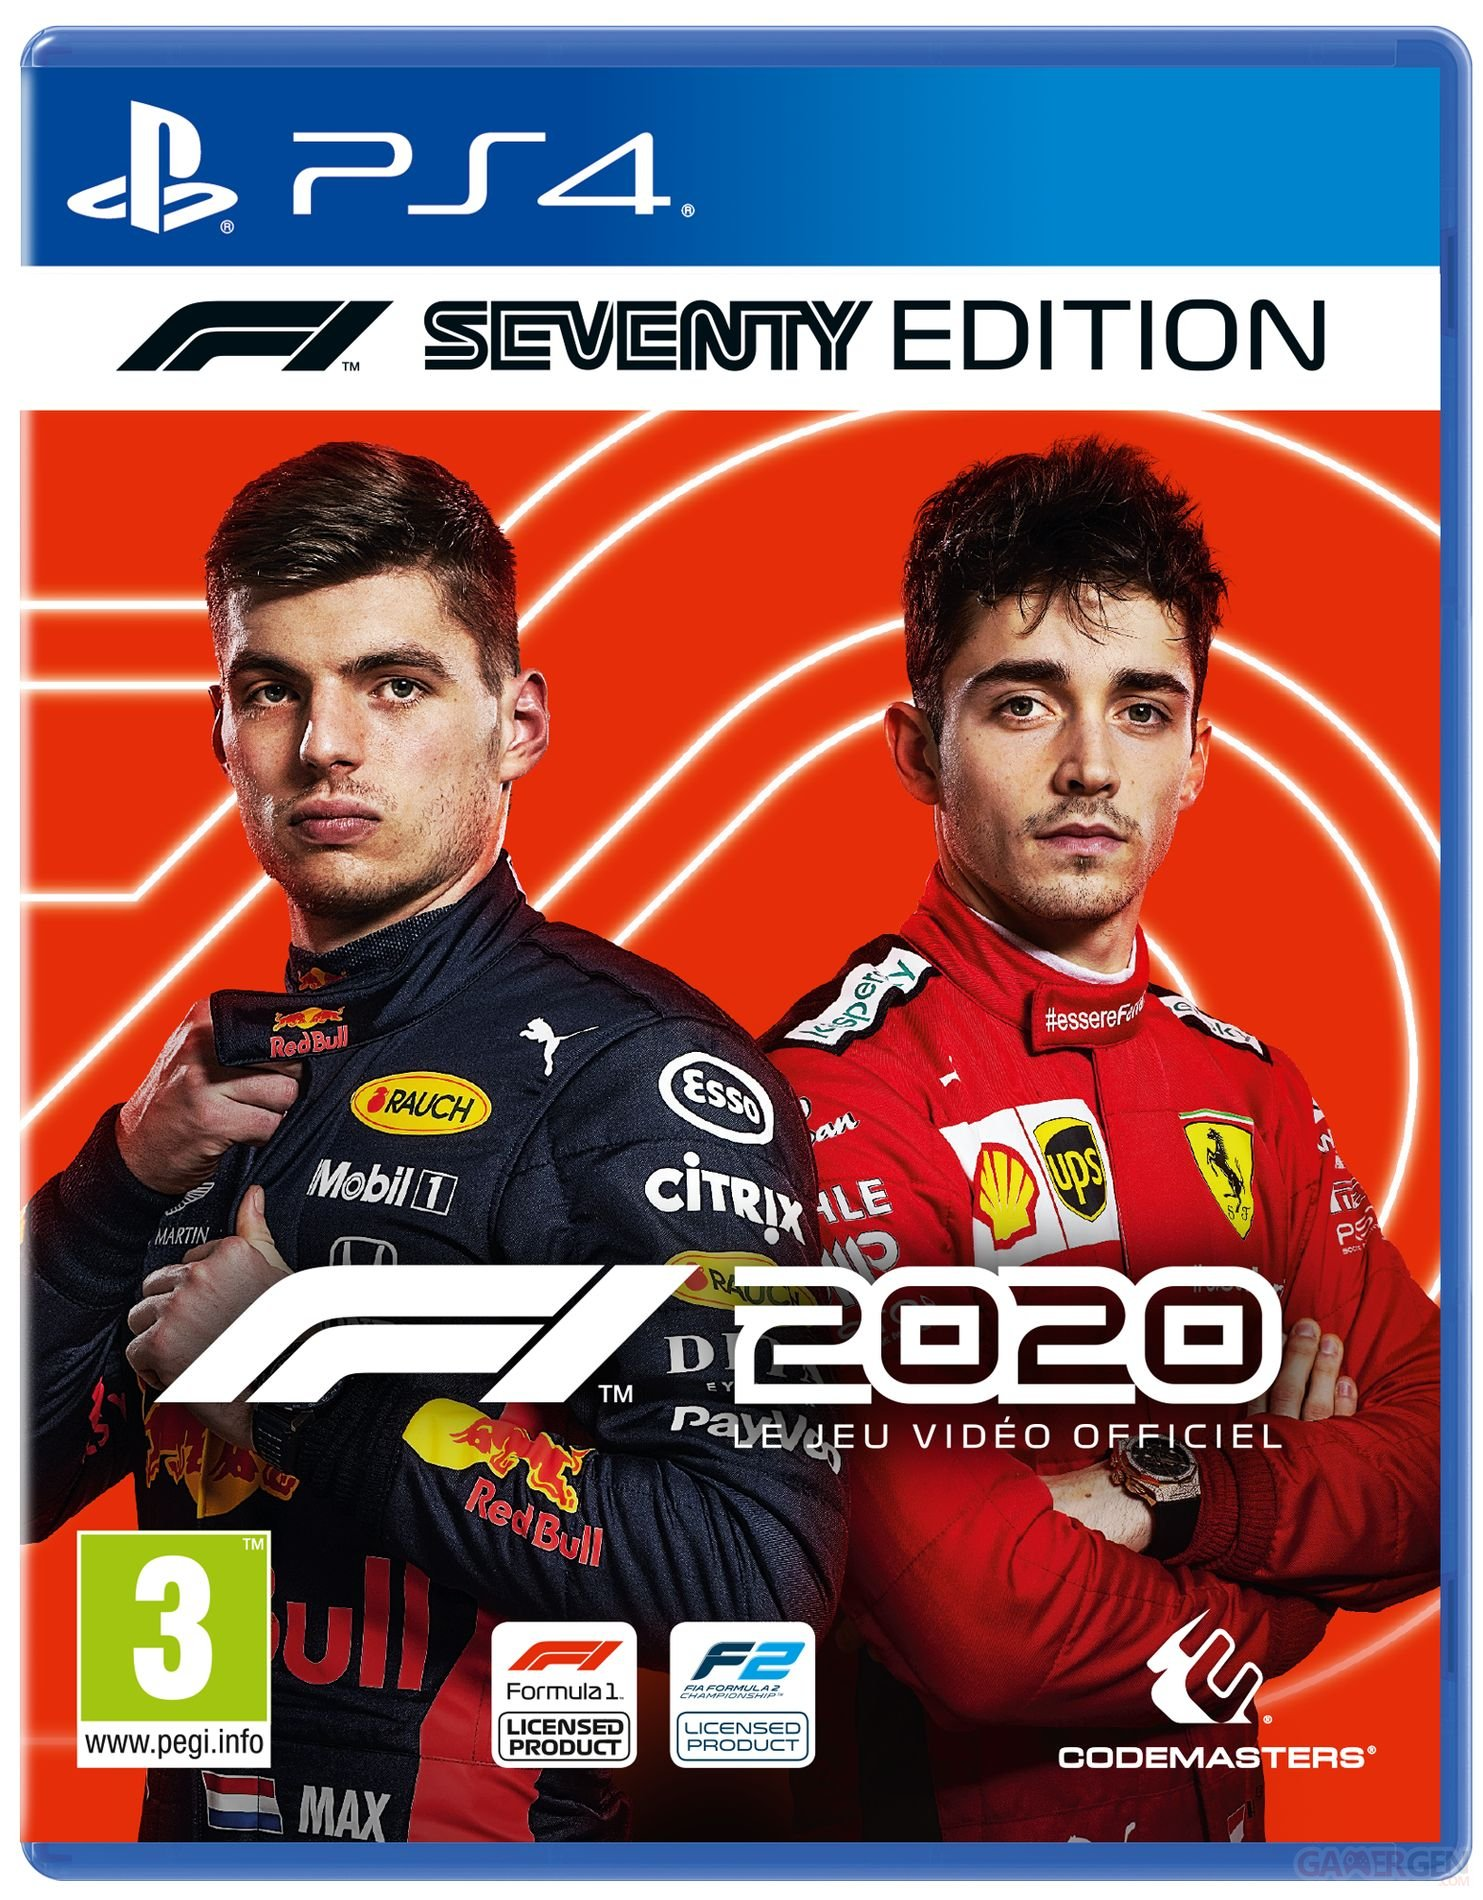 F1 2020 : une vidéo de gameplay sur le circuit de Zandvoort